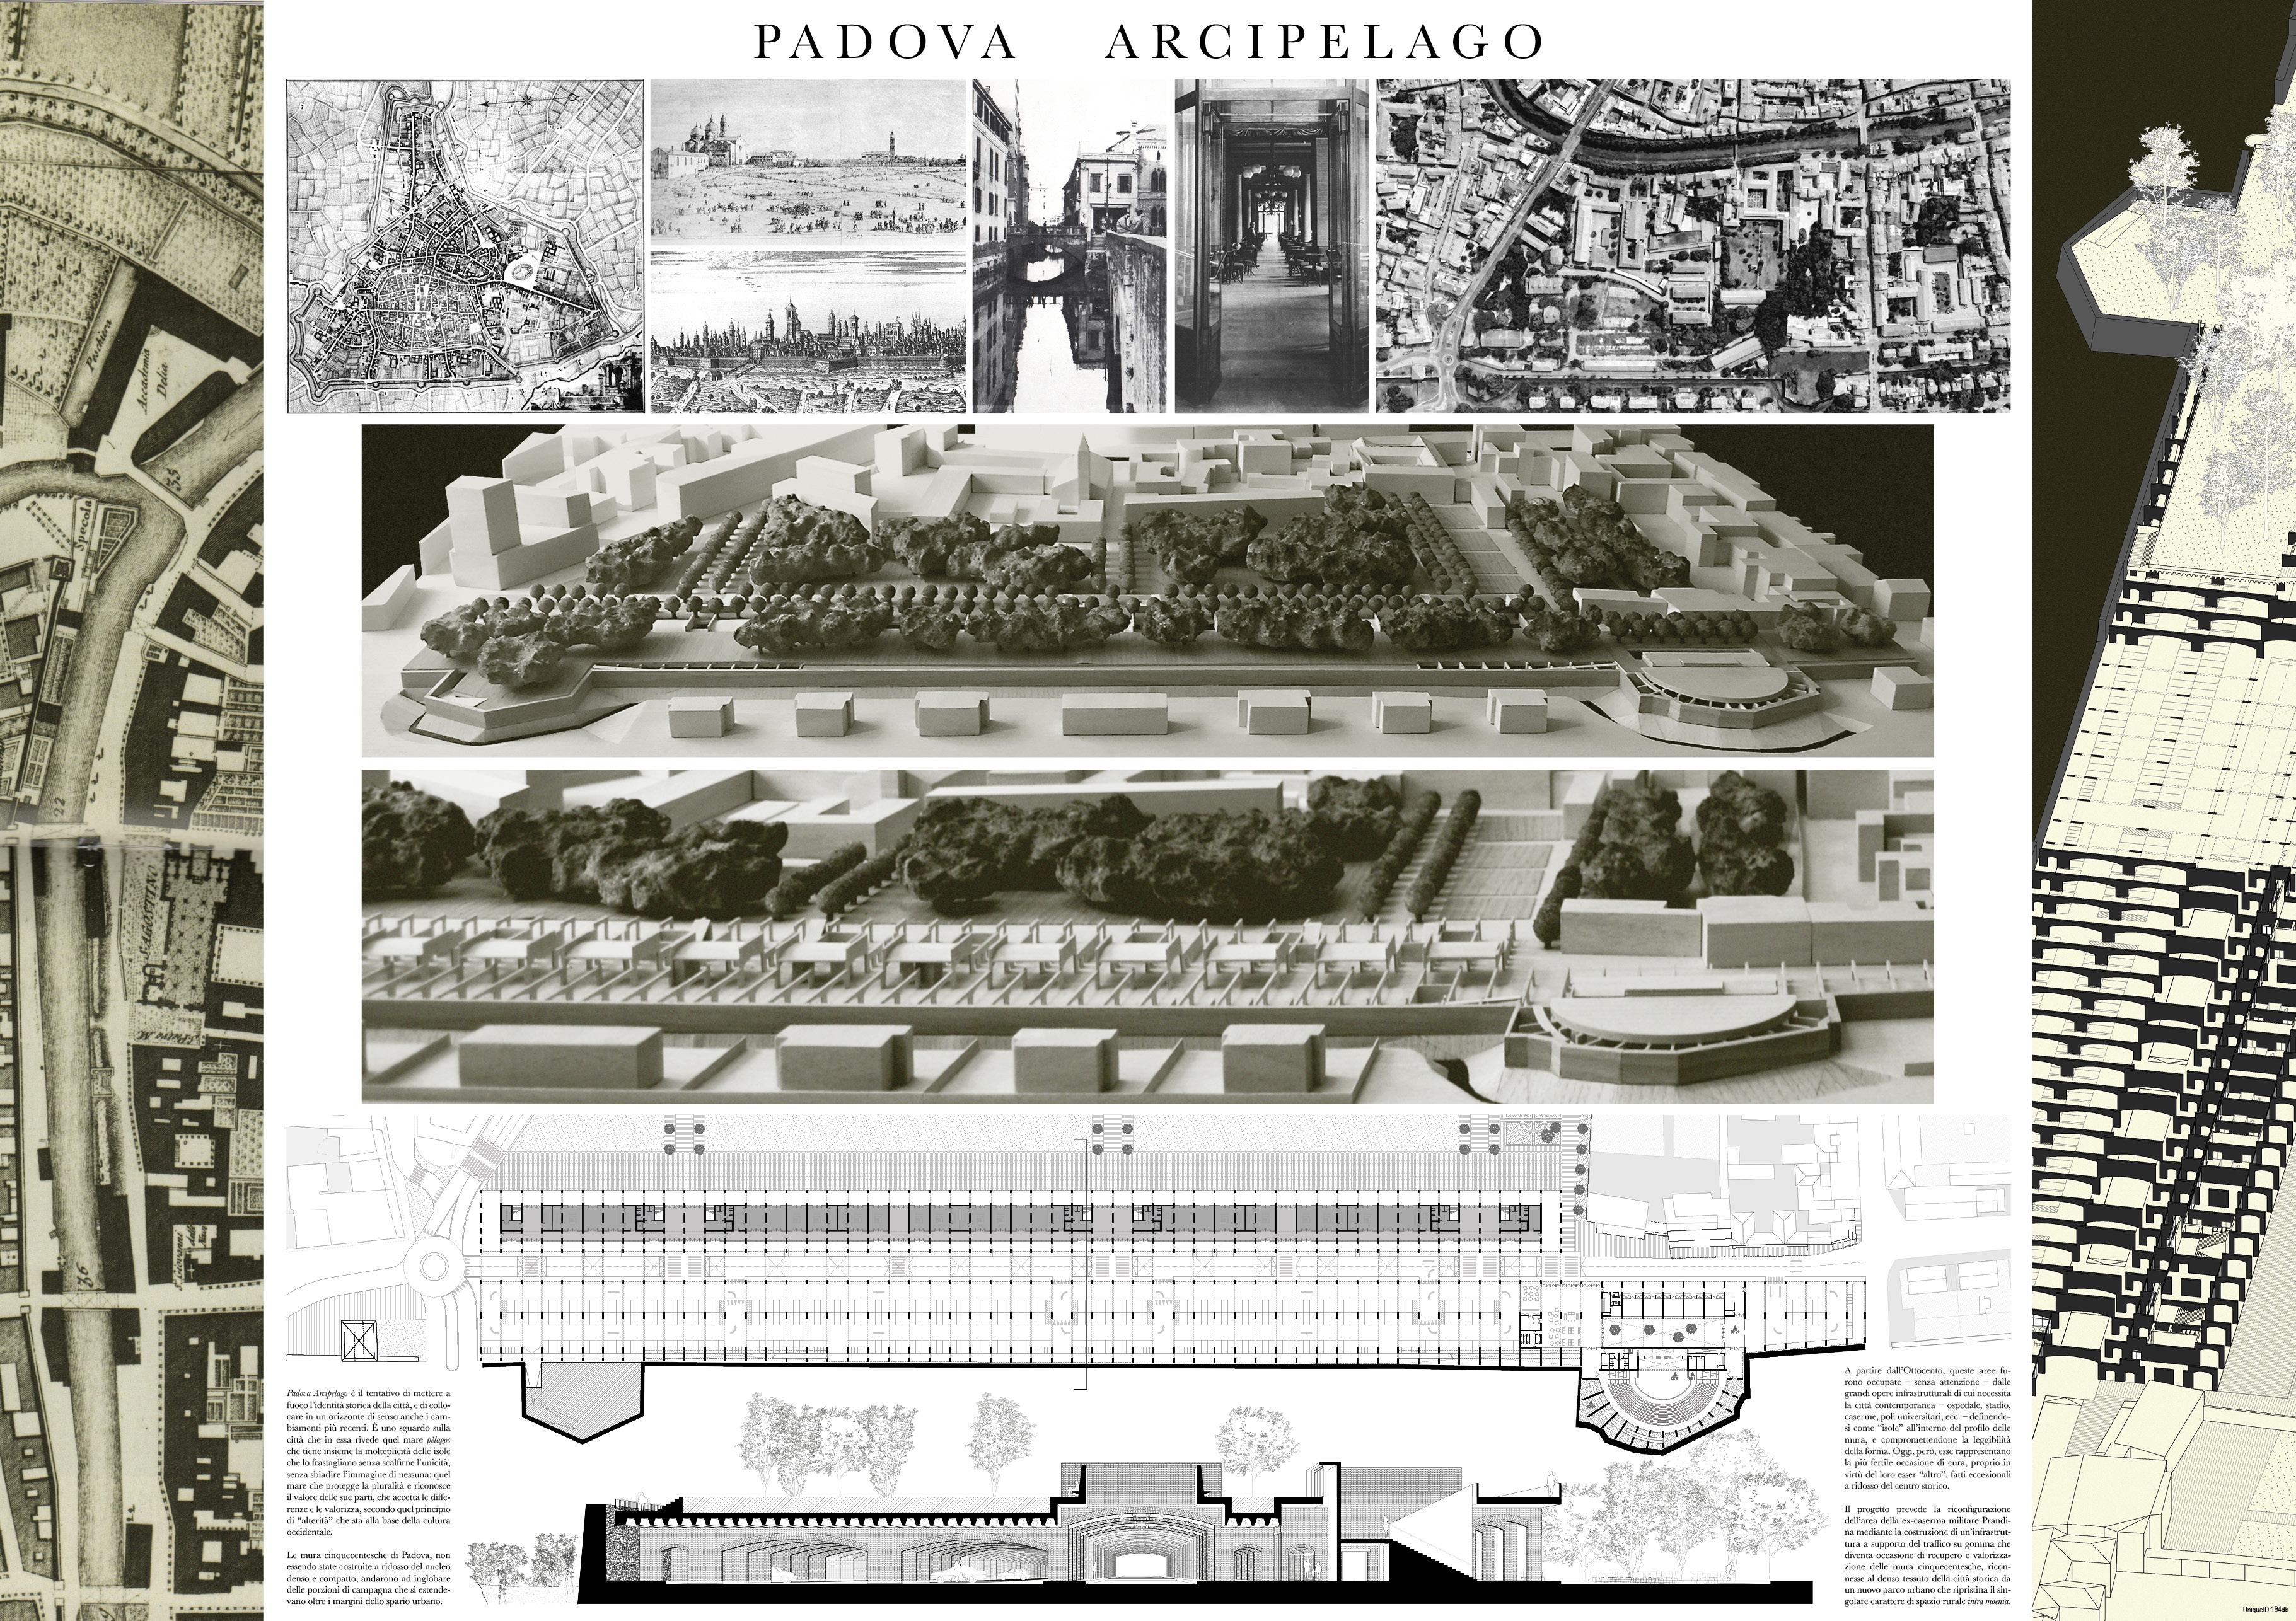 PADOVA ARCIPELAGO Board